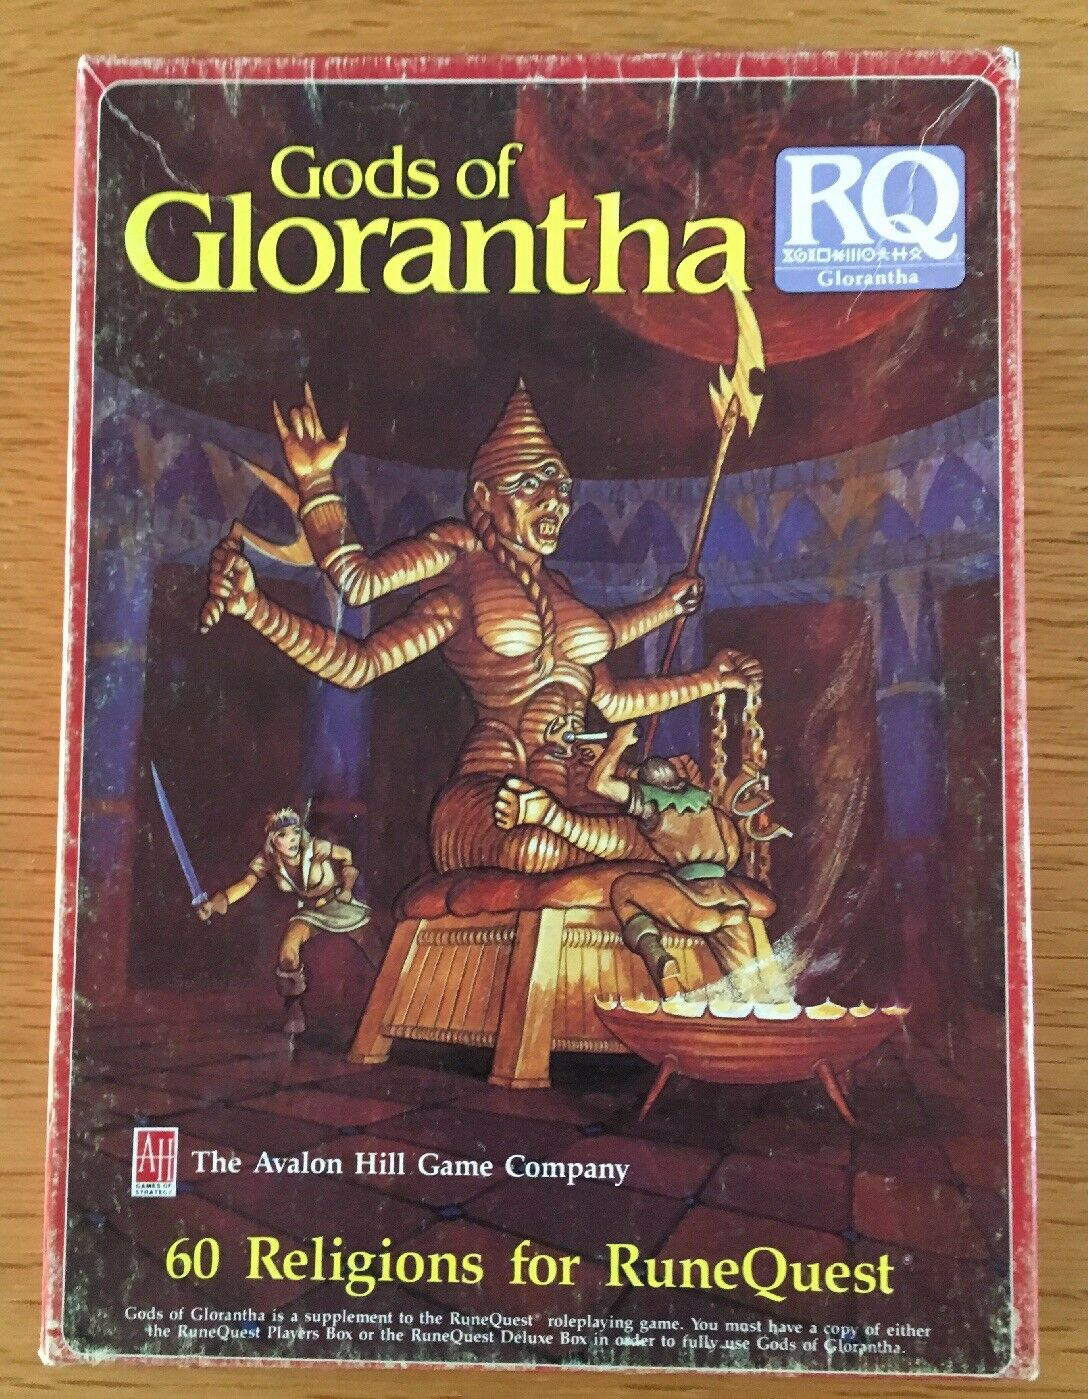 VINTAGE Runequest Gods OF glorantha 8577 Avalon Hill Box Set COMPLETA RARA